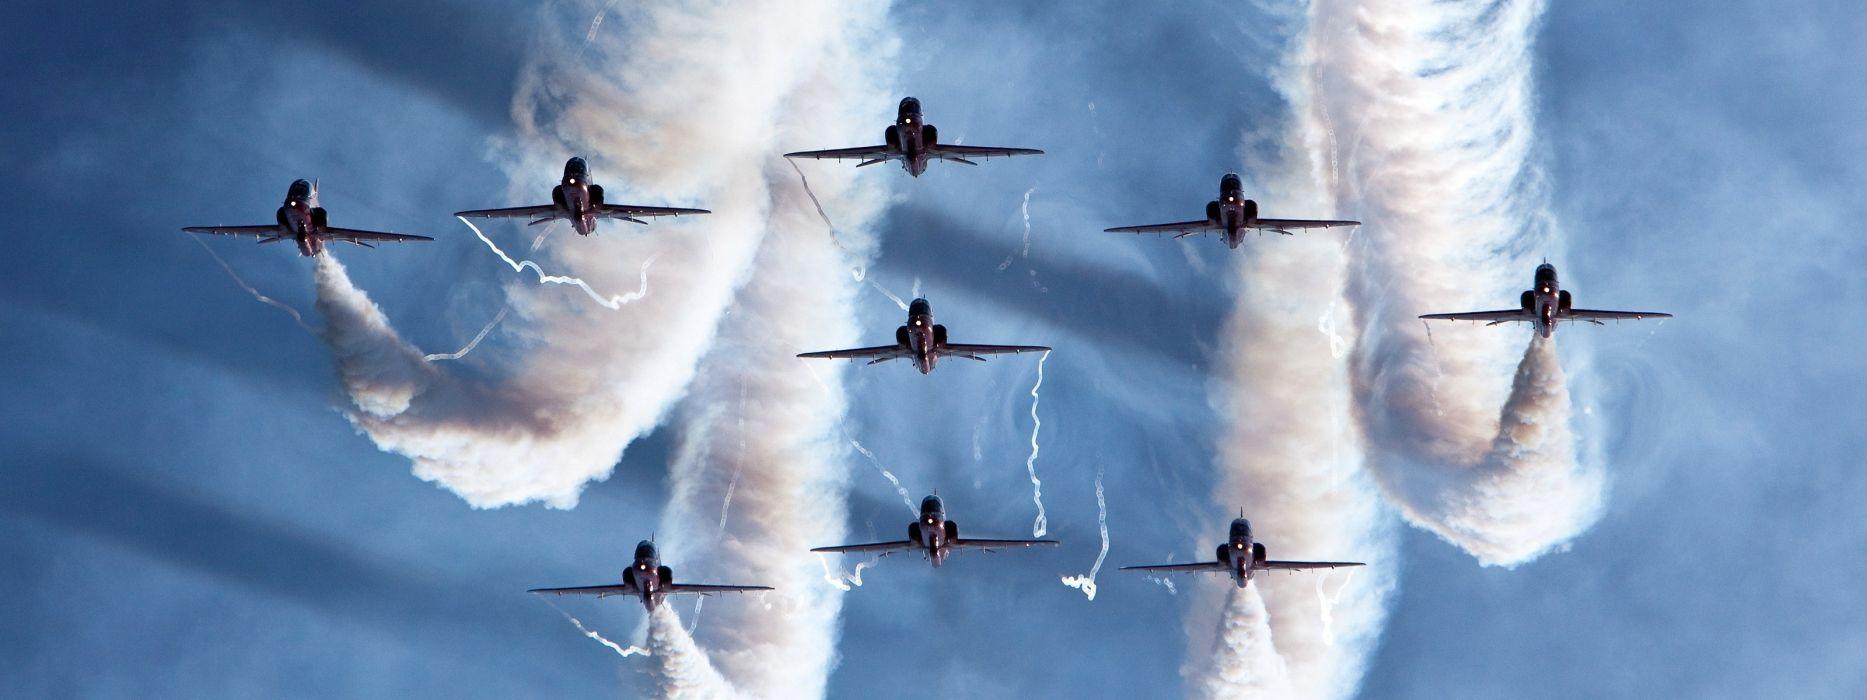 aircraft airplanes aerobatics smoke jets military fighters wallpaper